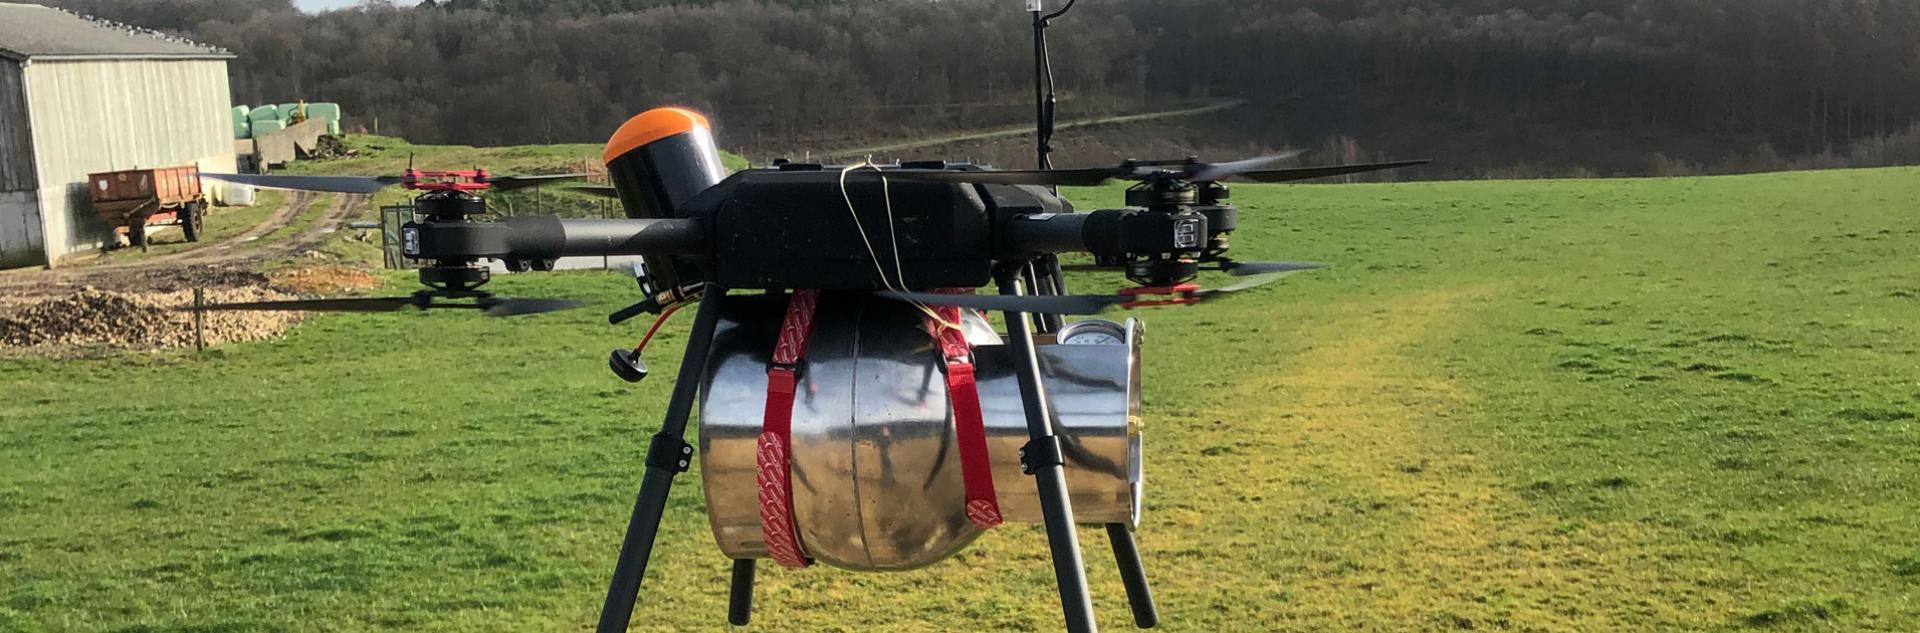 Centre d'Innovation Drones Normandie (CIDN)